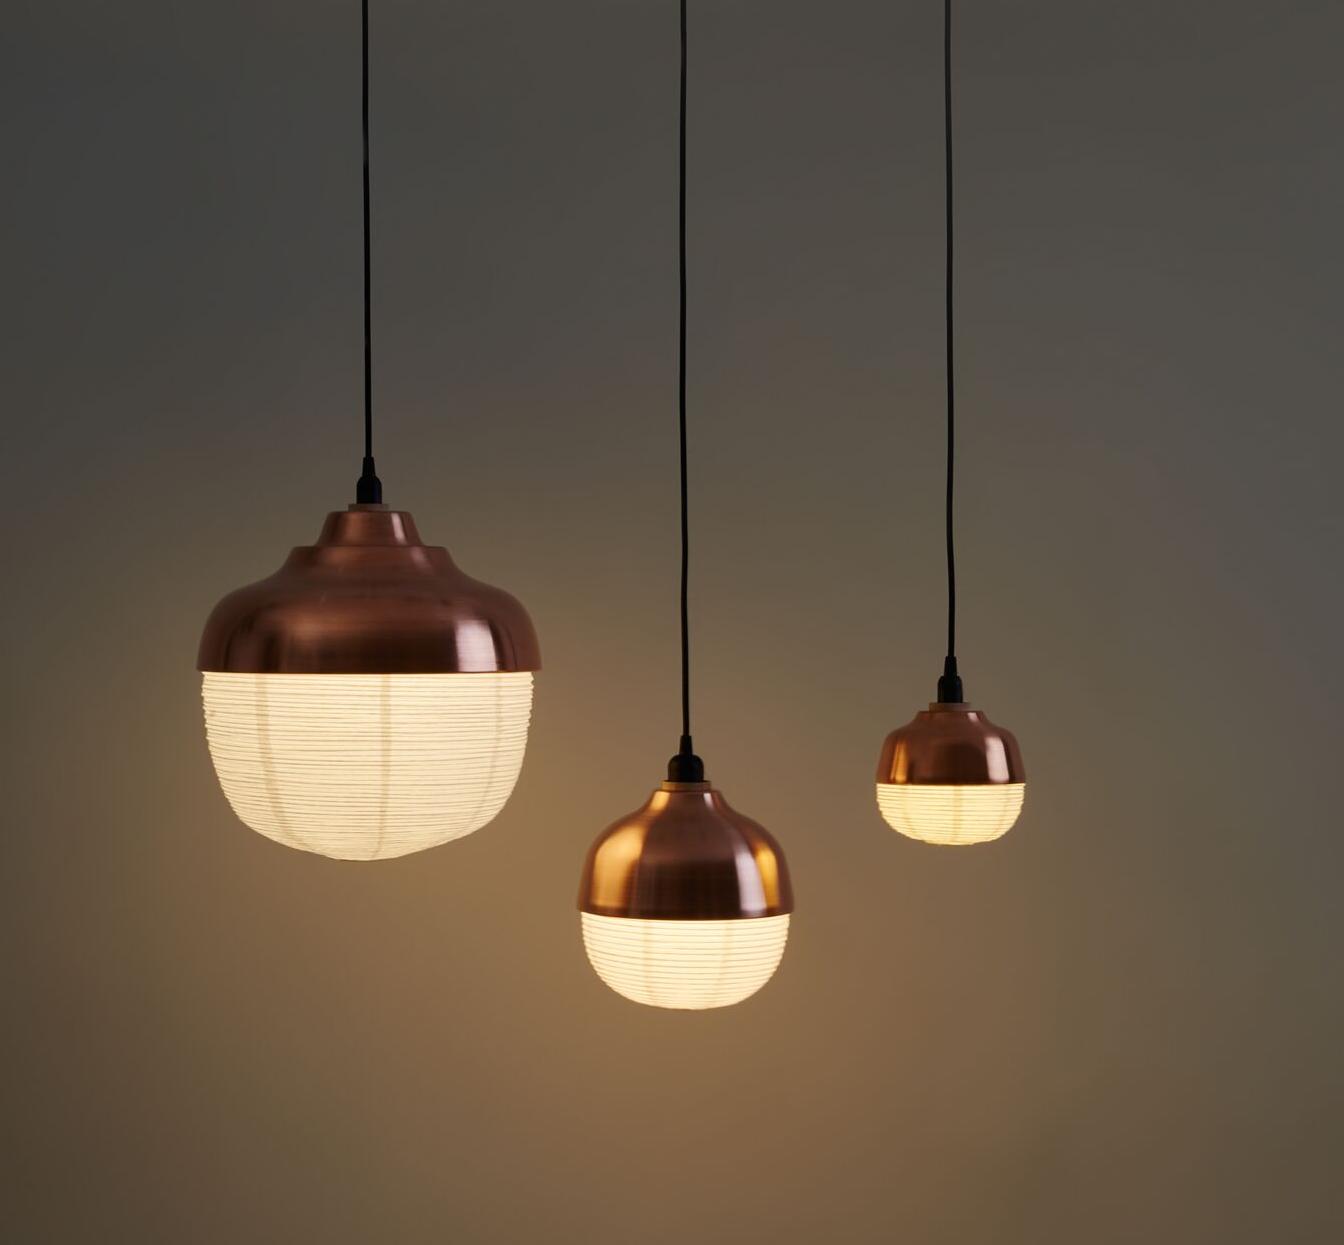 suspension the new old light m cuivre led 24cm h28cm kimu luminaires nedgis. Black Bedroom Furniture Sets. Home Design Ideas